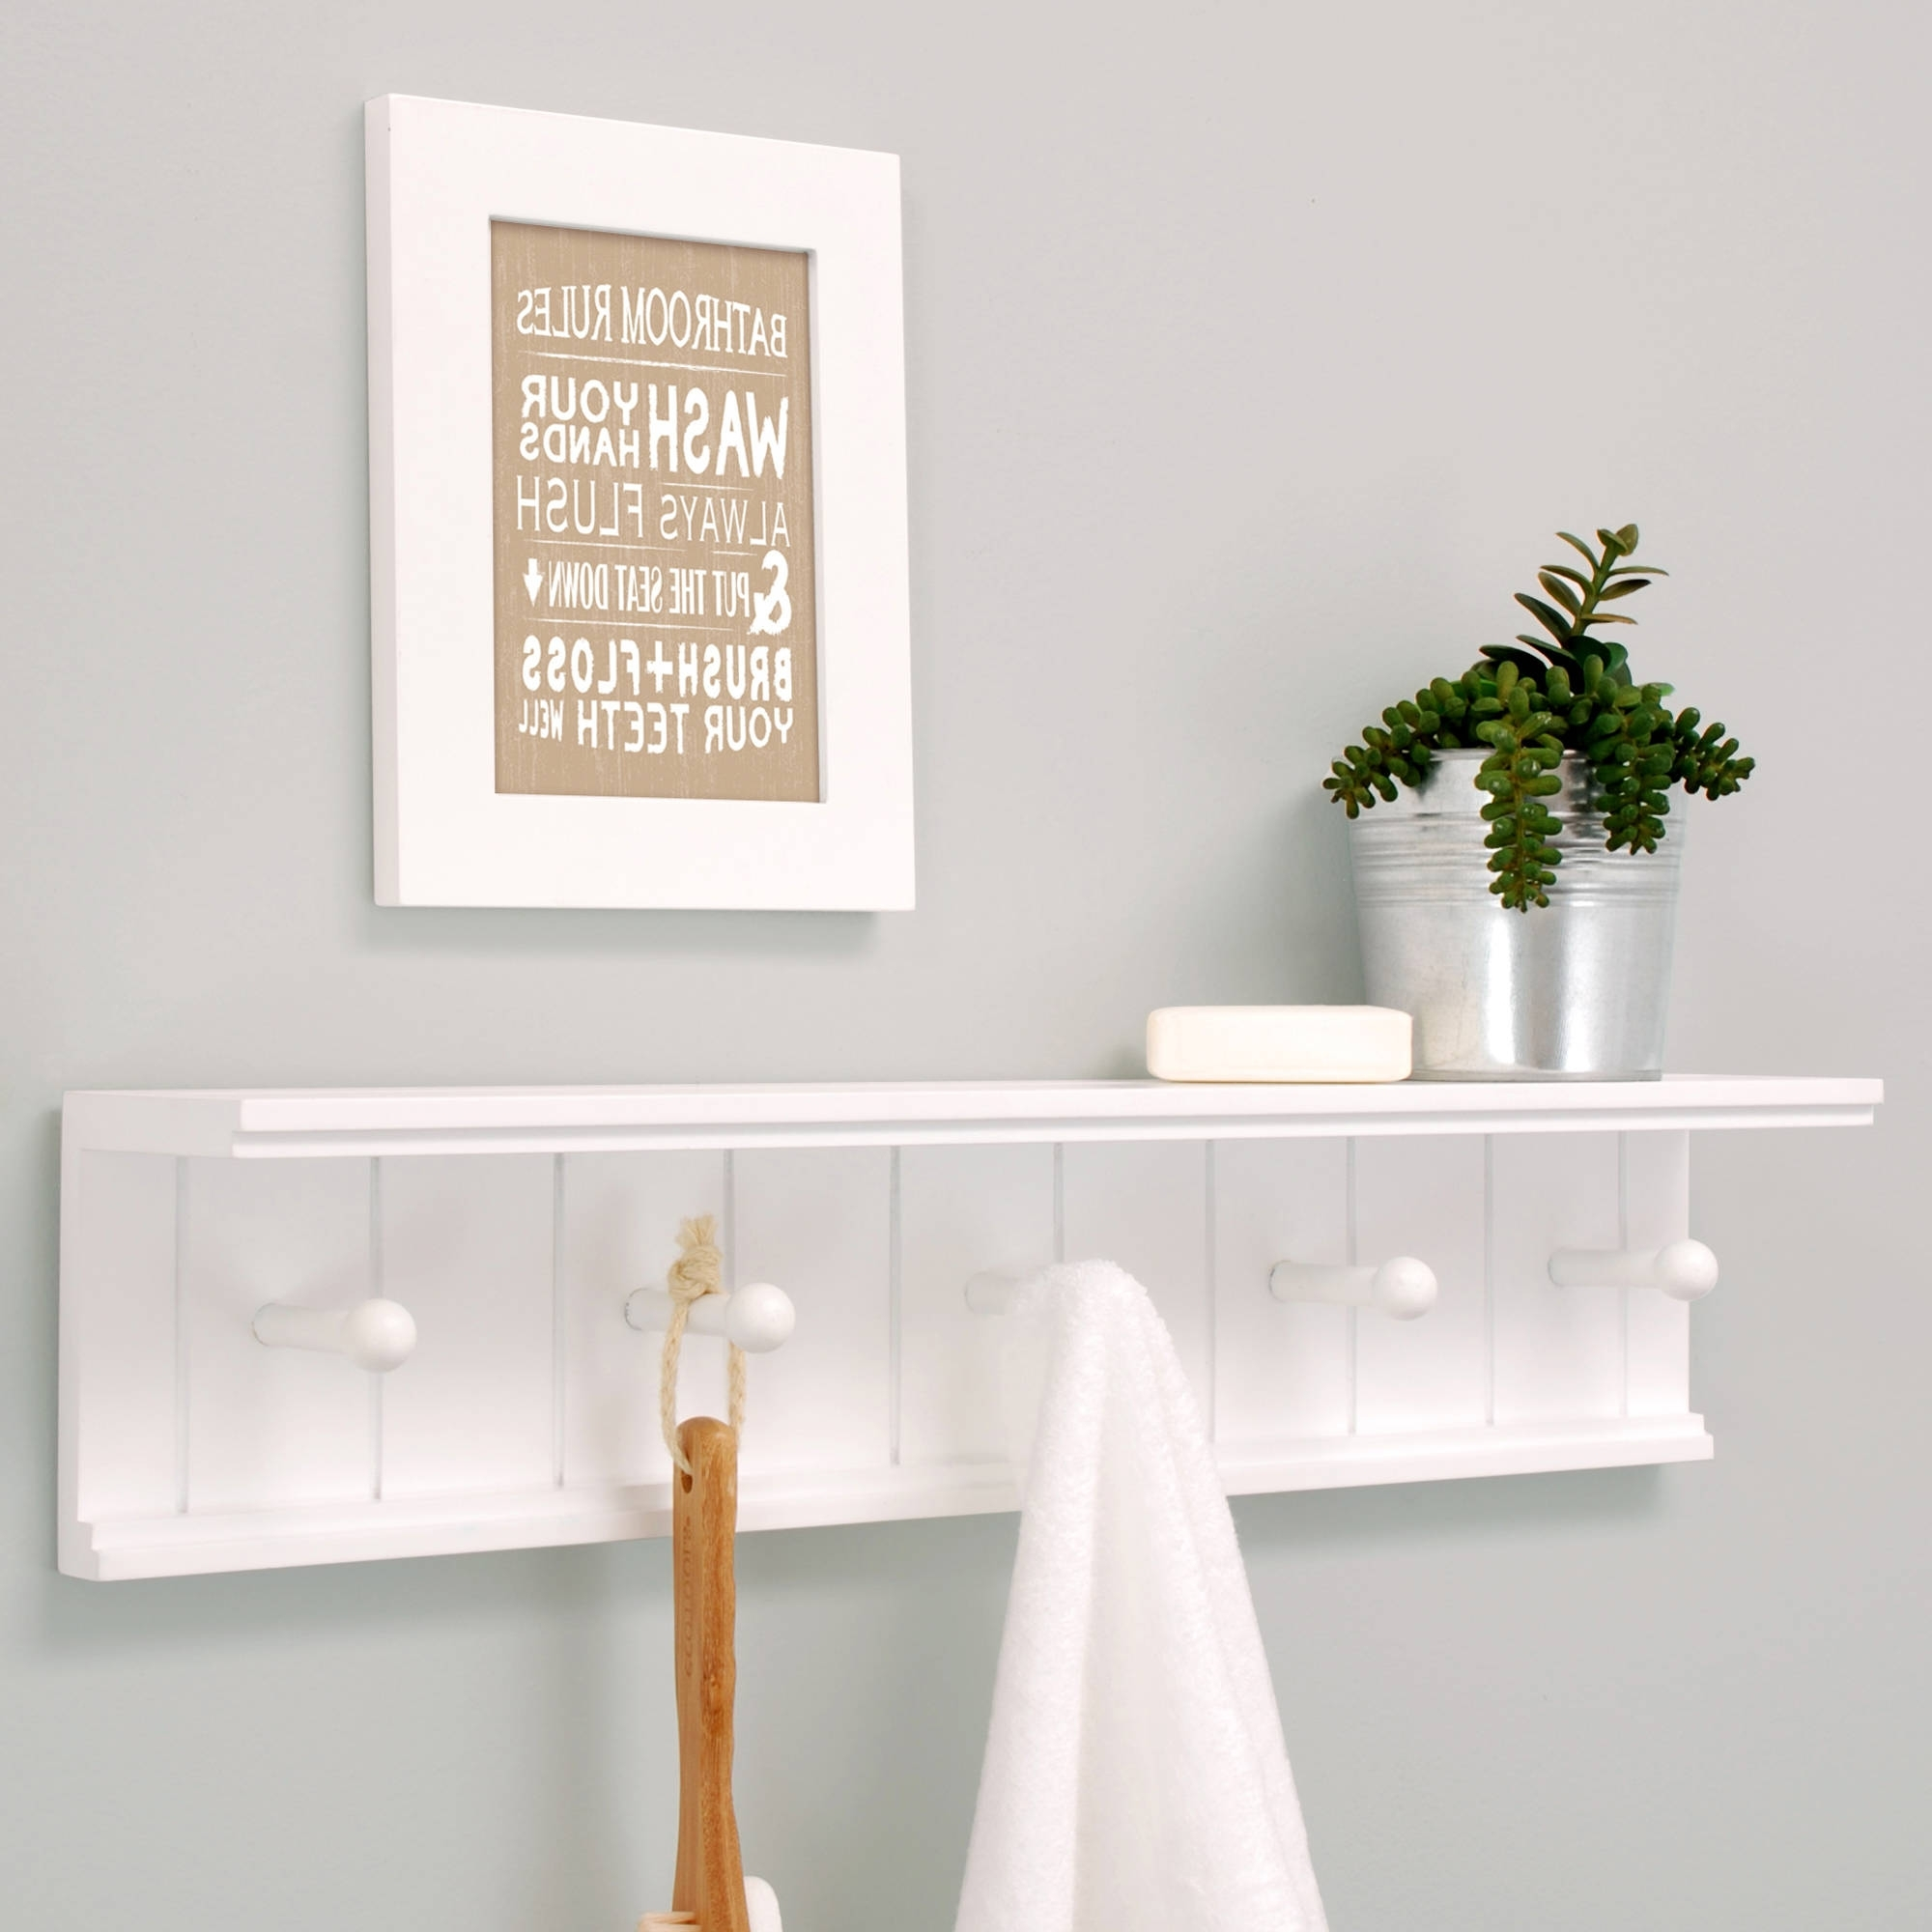 "2018 White Wall Shelves Throughout Kiera Grace Kian 24"" Wall Shelf With 5 Pegs, White – Walmart (View 9 of 15)"